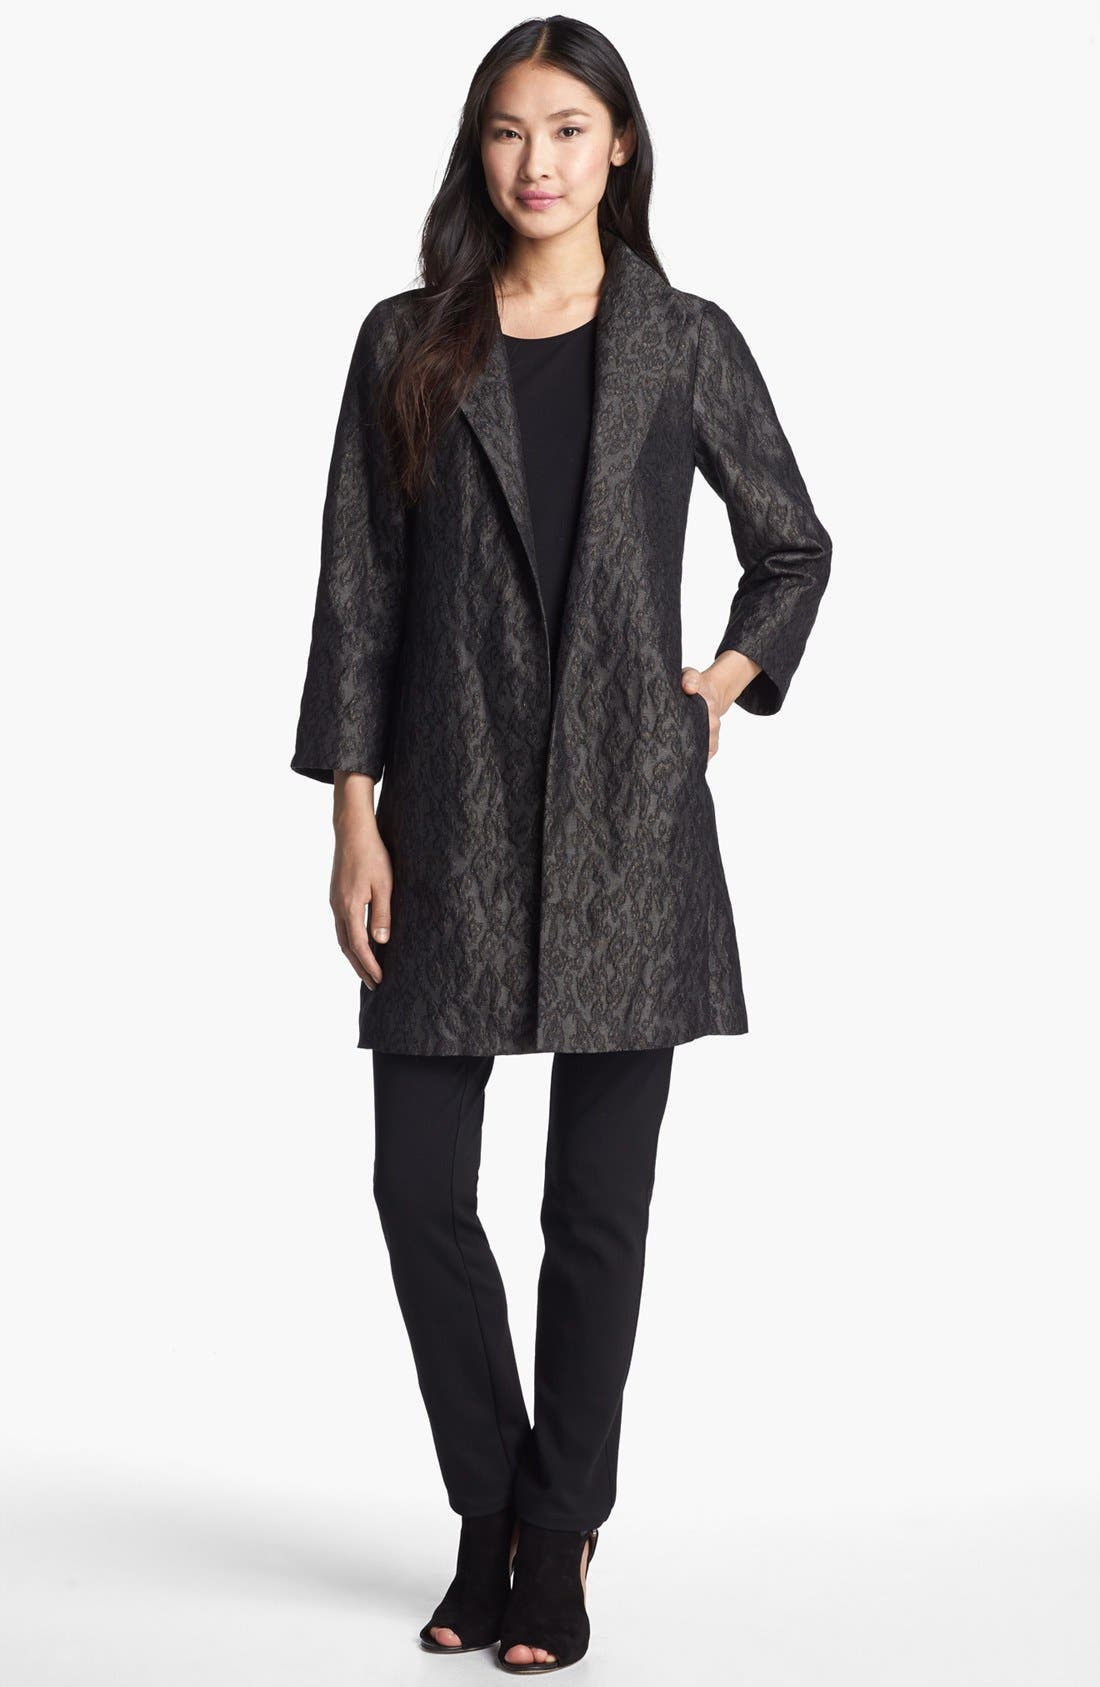 Main Image - Eileen Fisher 'Ikat Embers' Jacquard Jacket